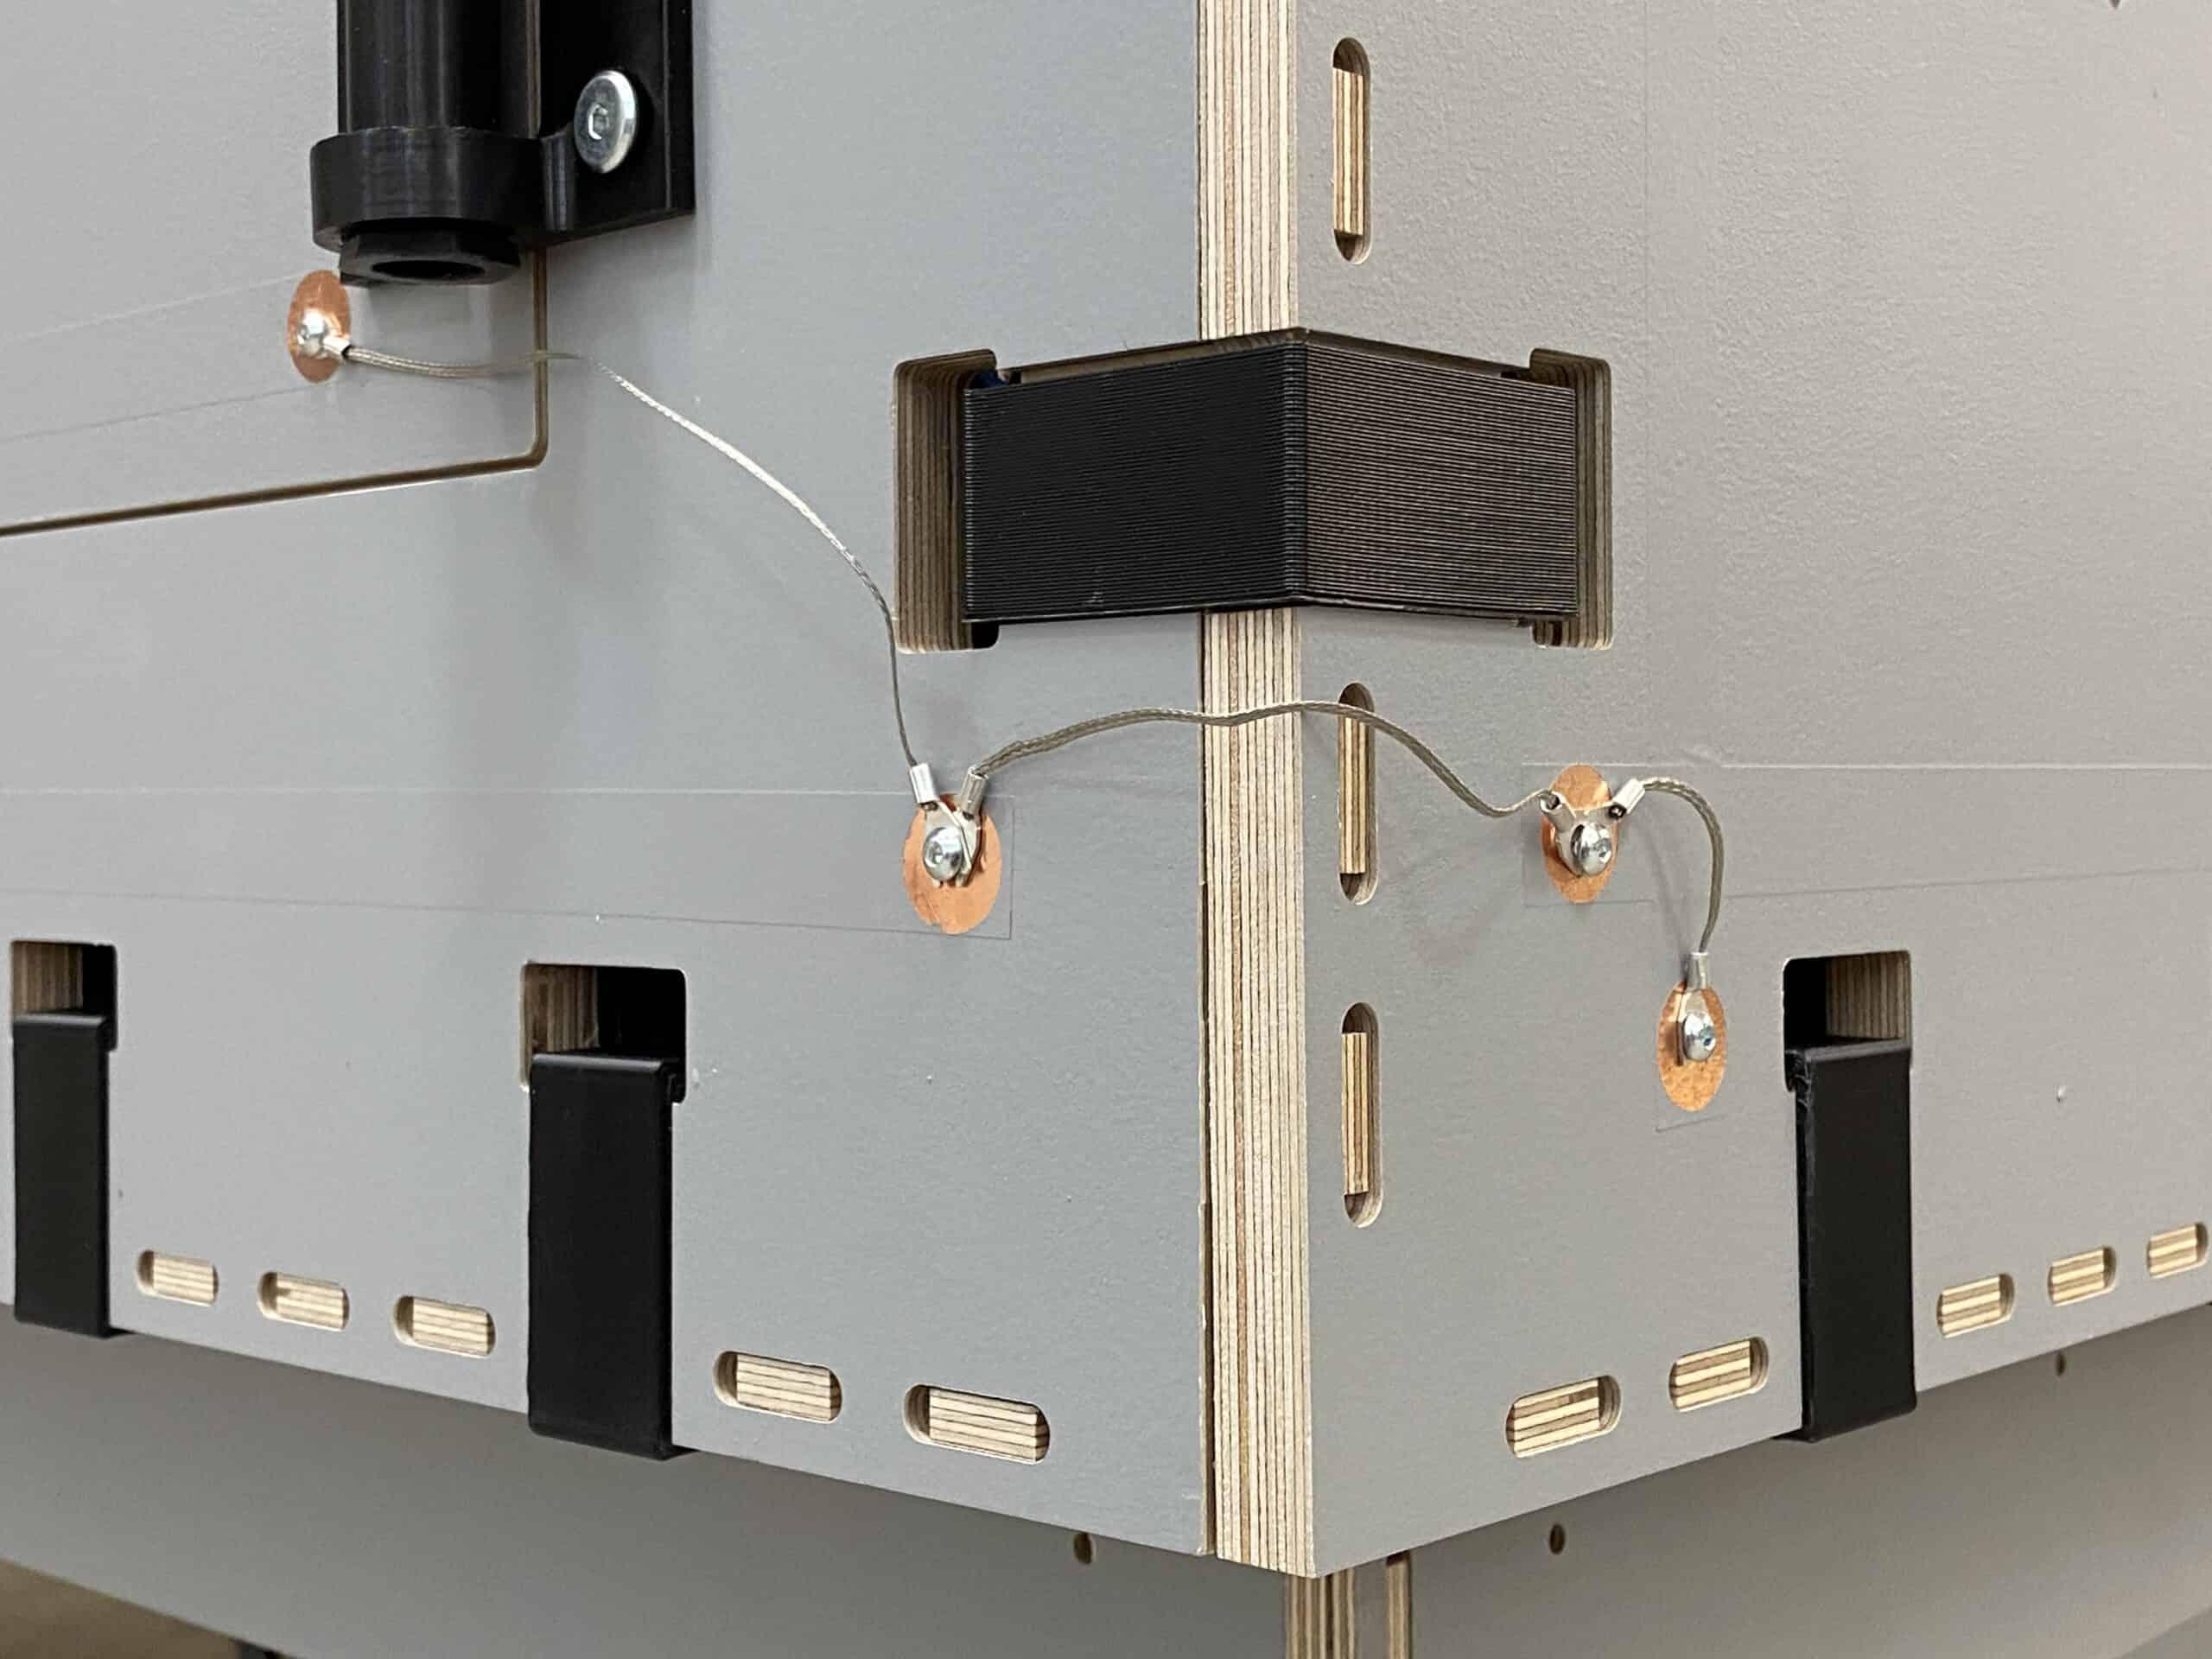 Production ready AC1120M mmWaveTest chamber